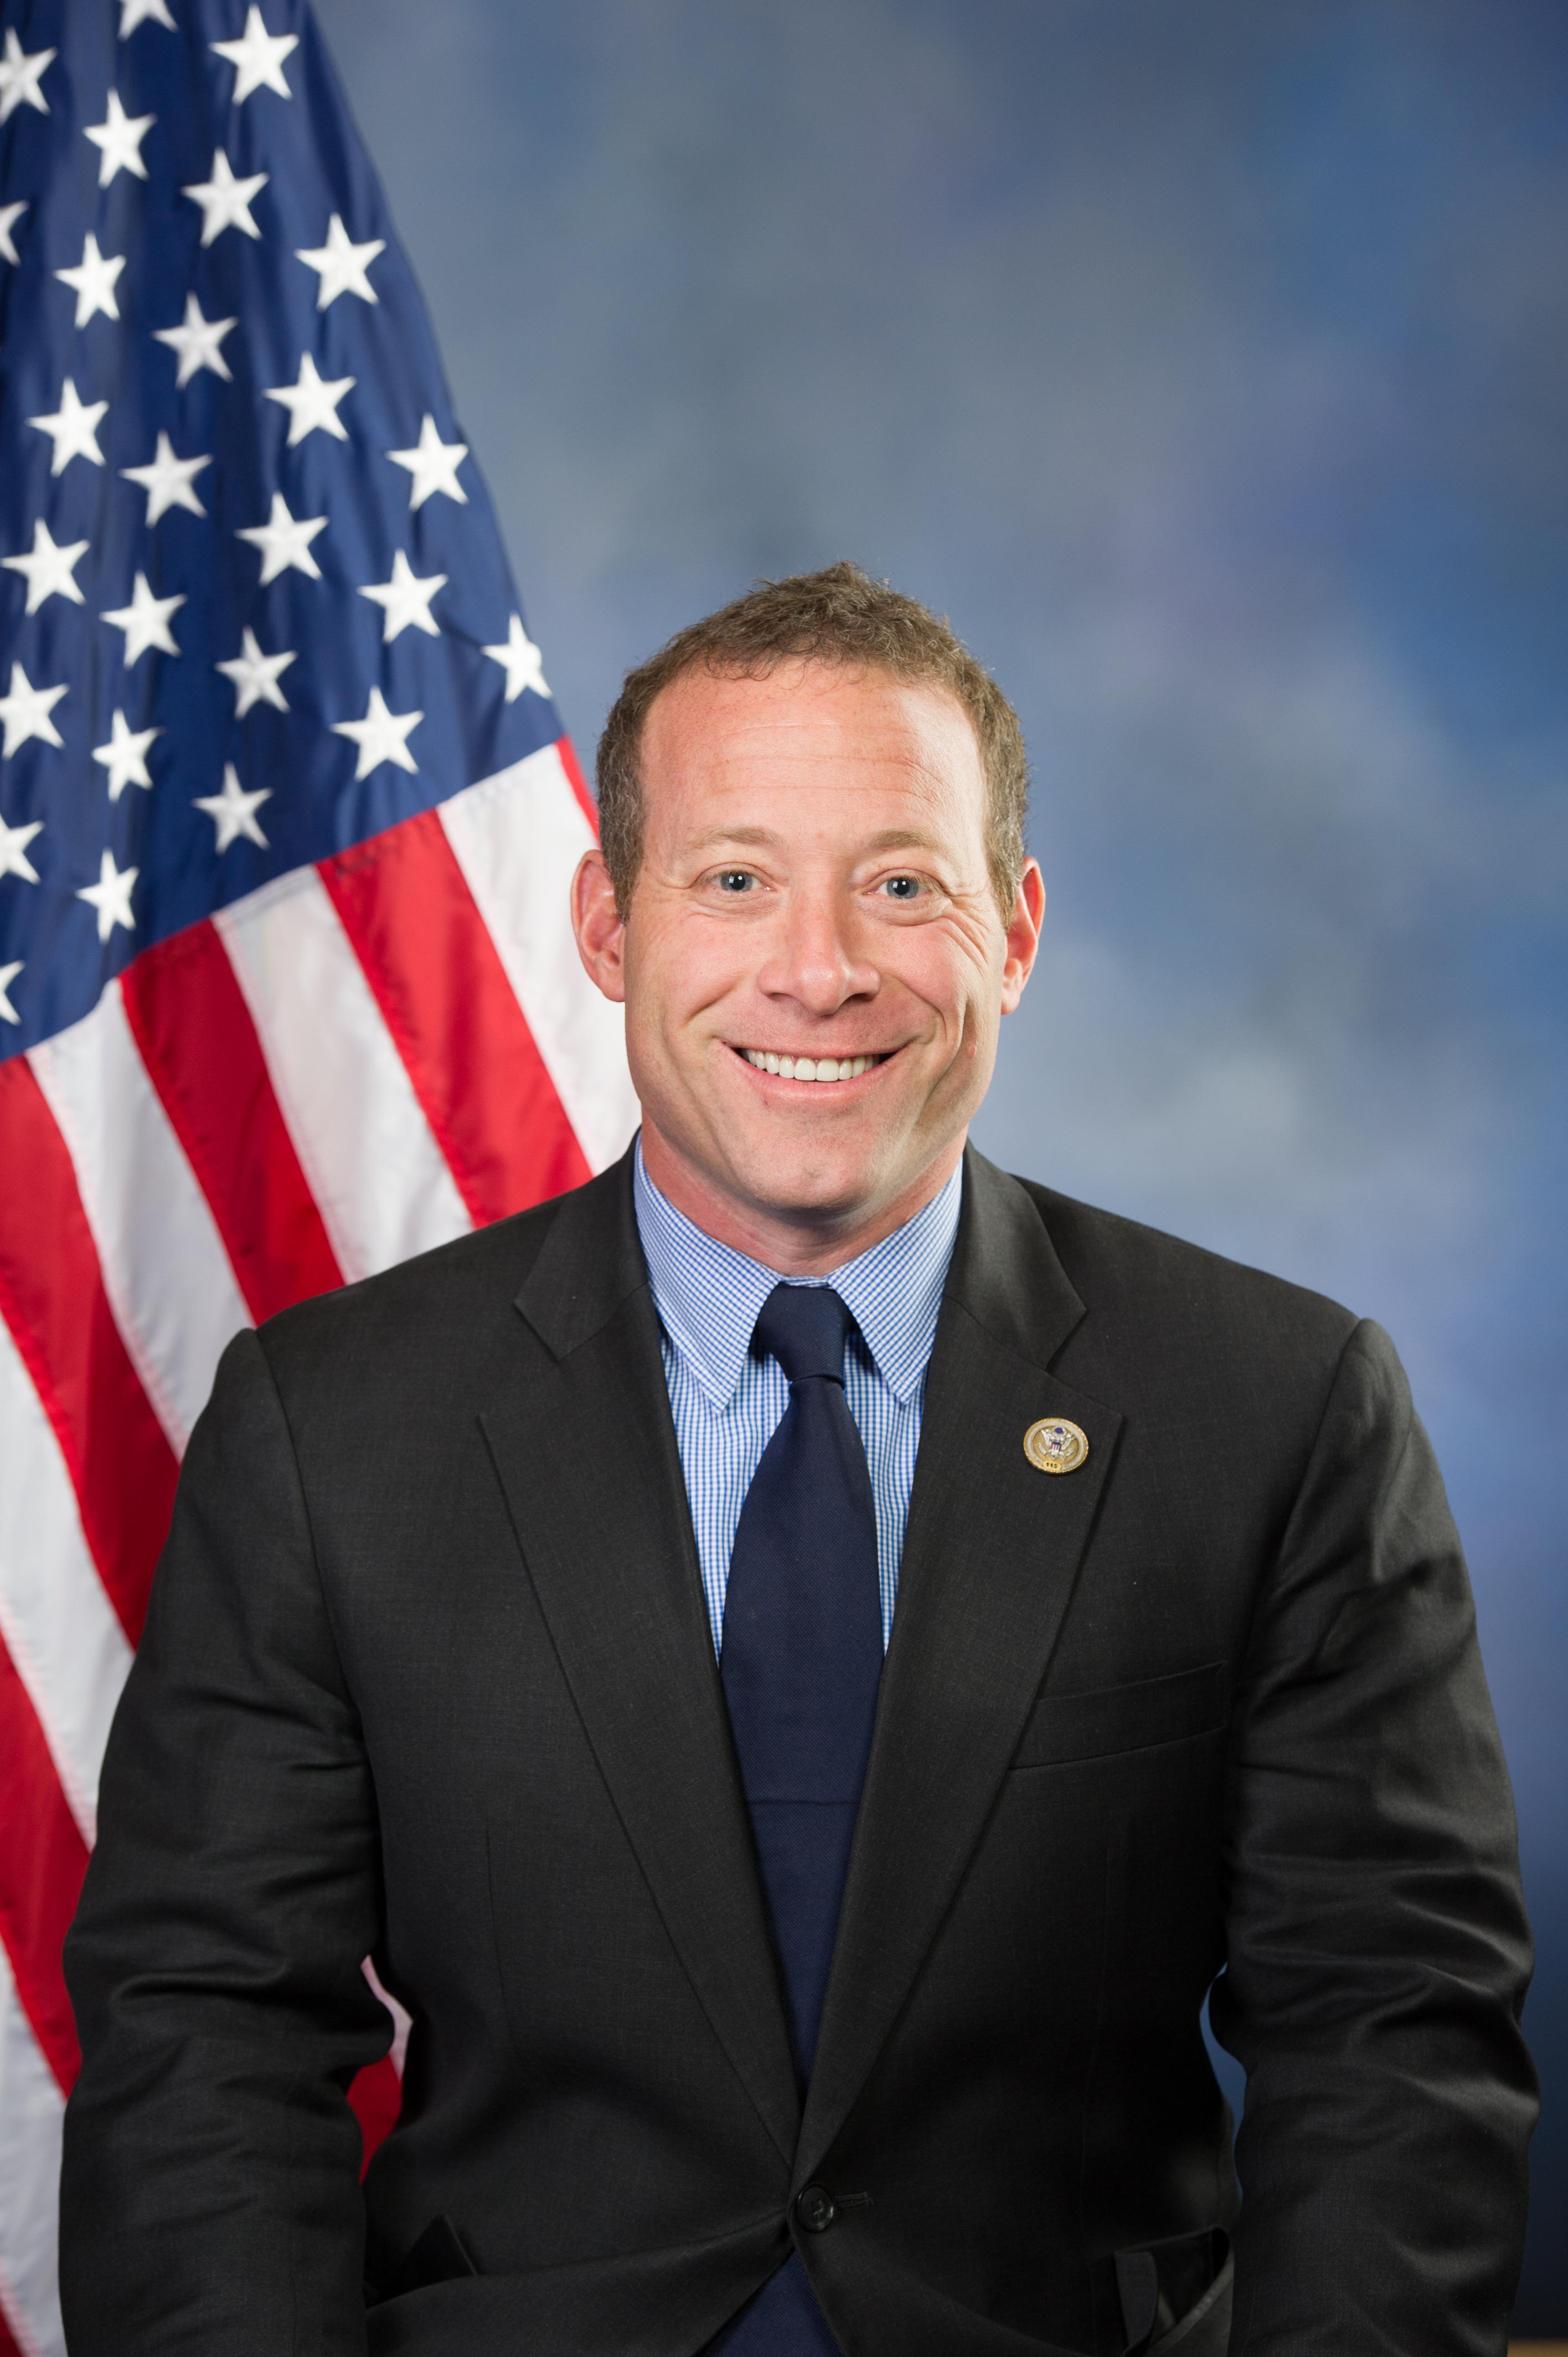 Congressman Josh Gottheimer